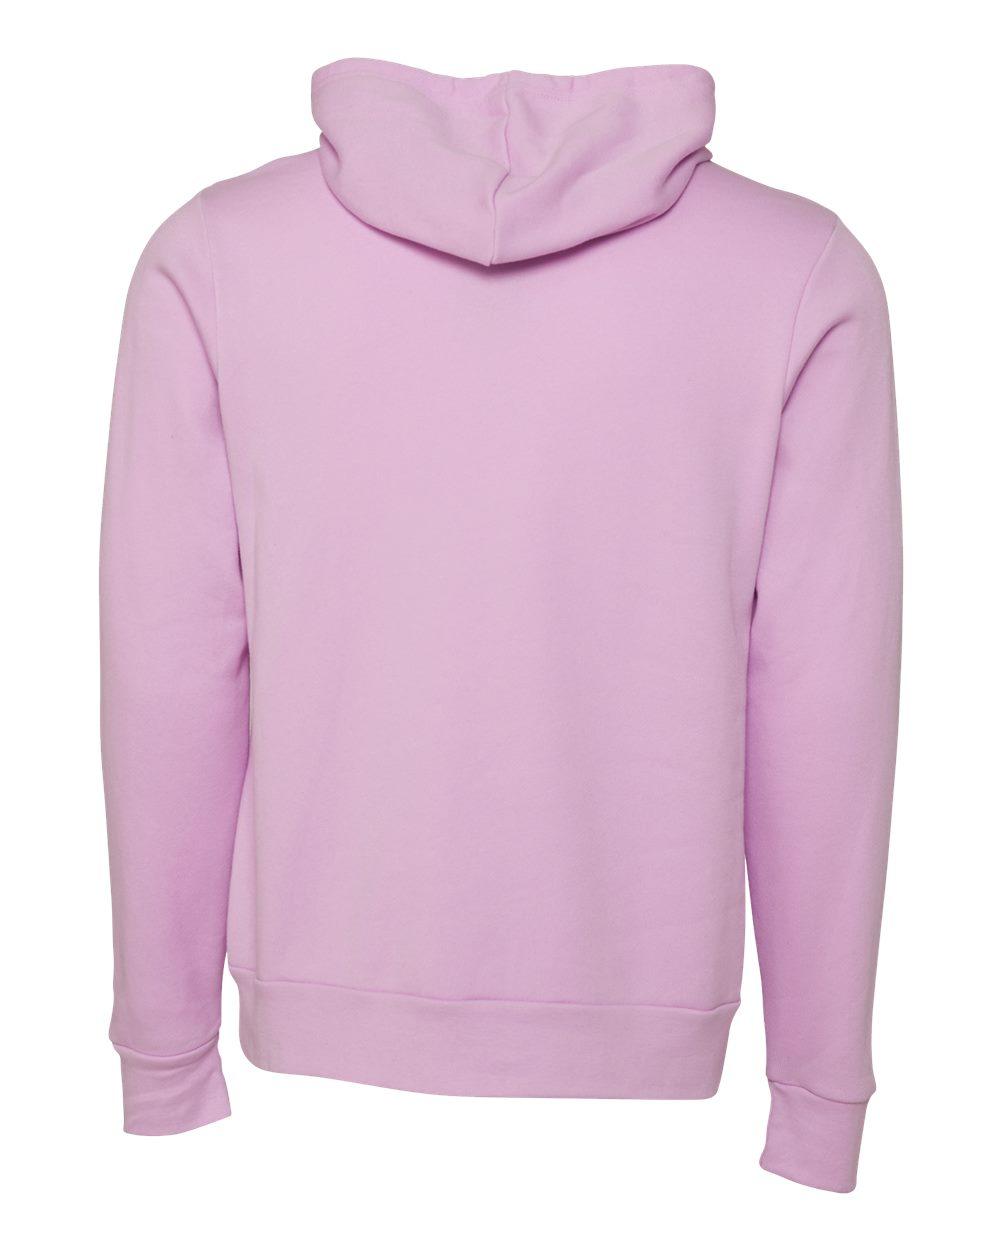 Bella-Canvas-Unisex-Sponge-Hooded-Pullover-Sweatshirt-Blank-3719-up-to-2XL thumbnail 69